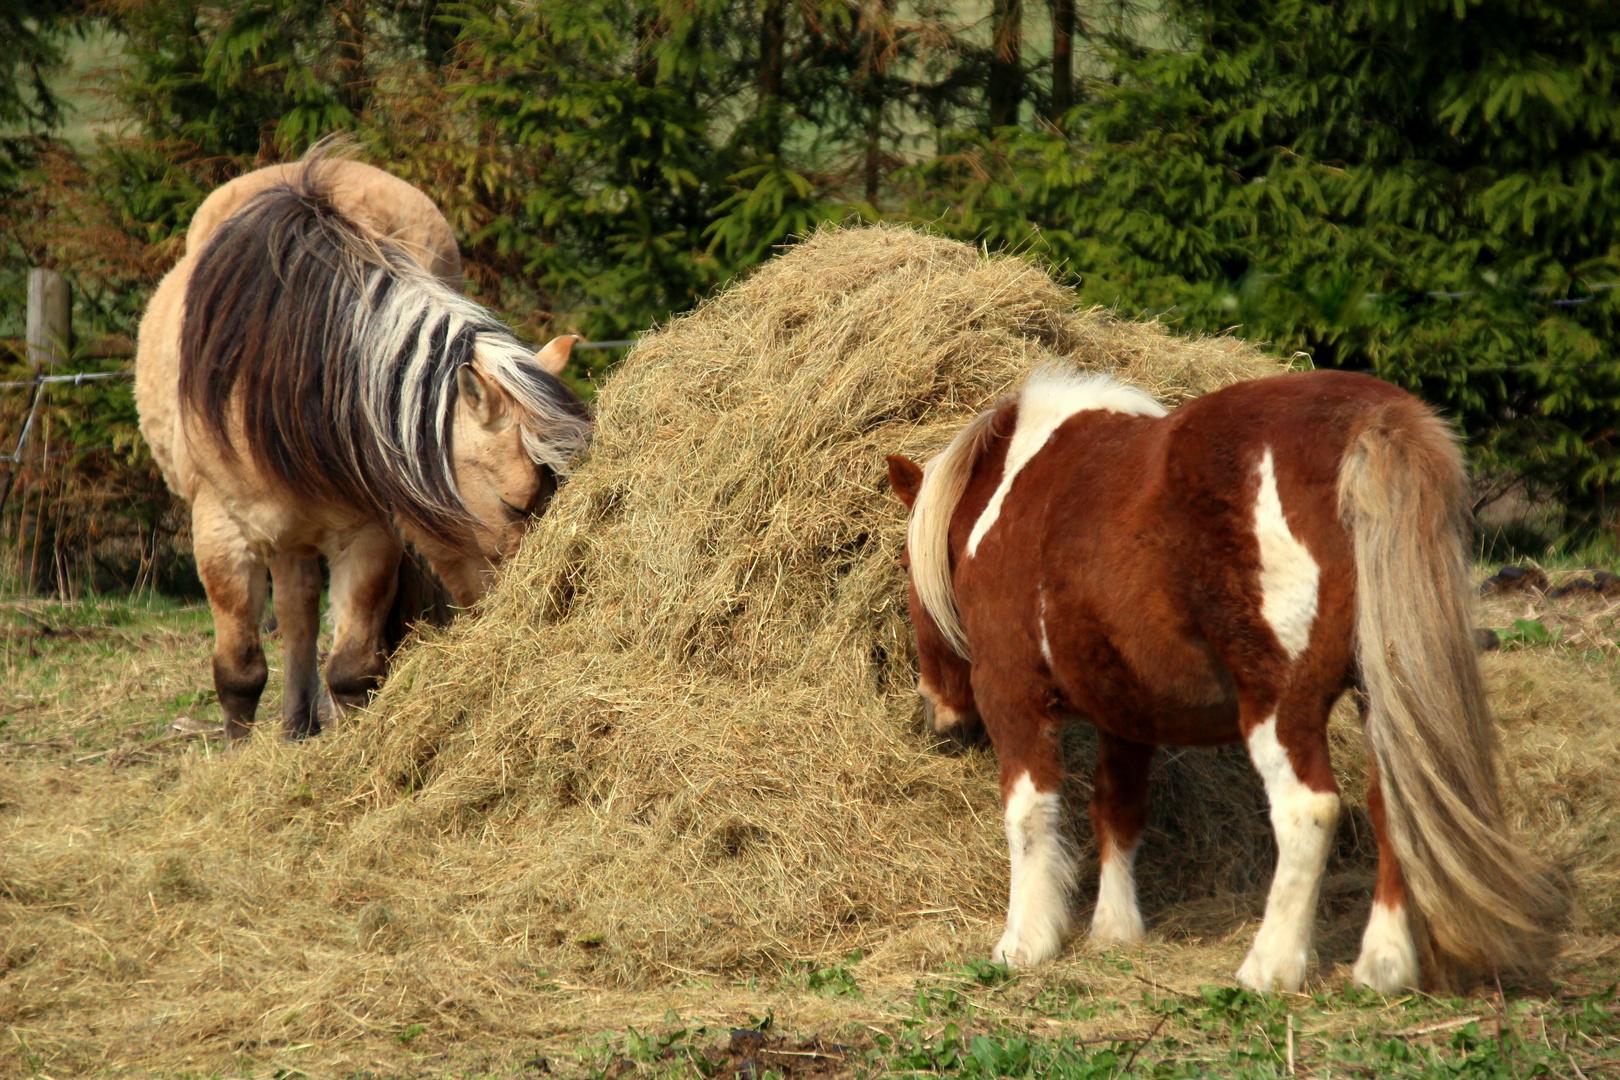 Pferdedoppelporträt